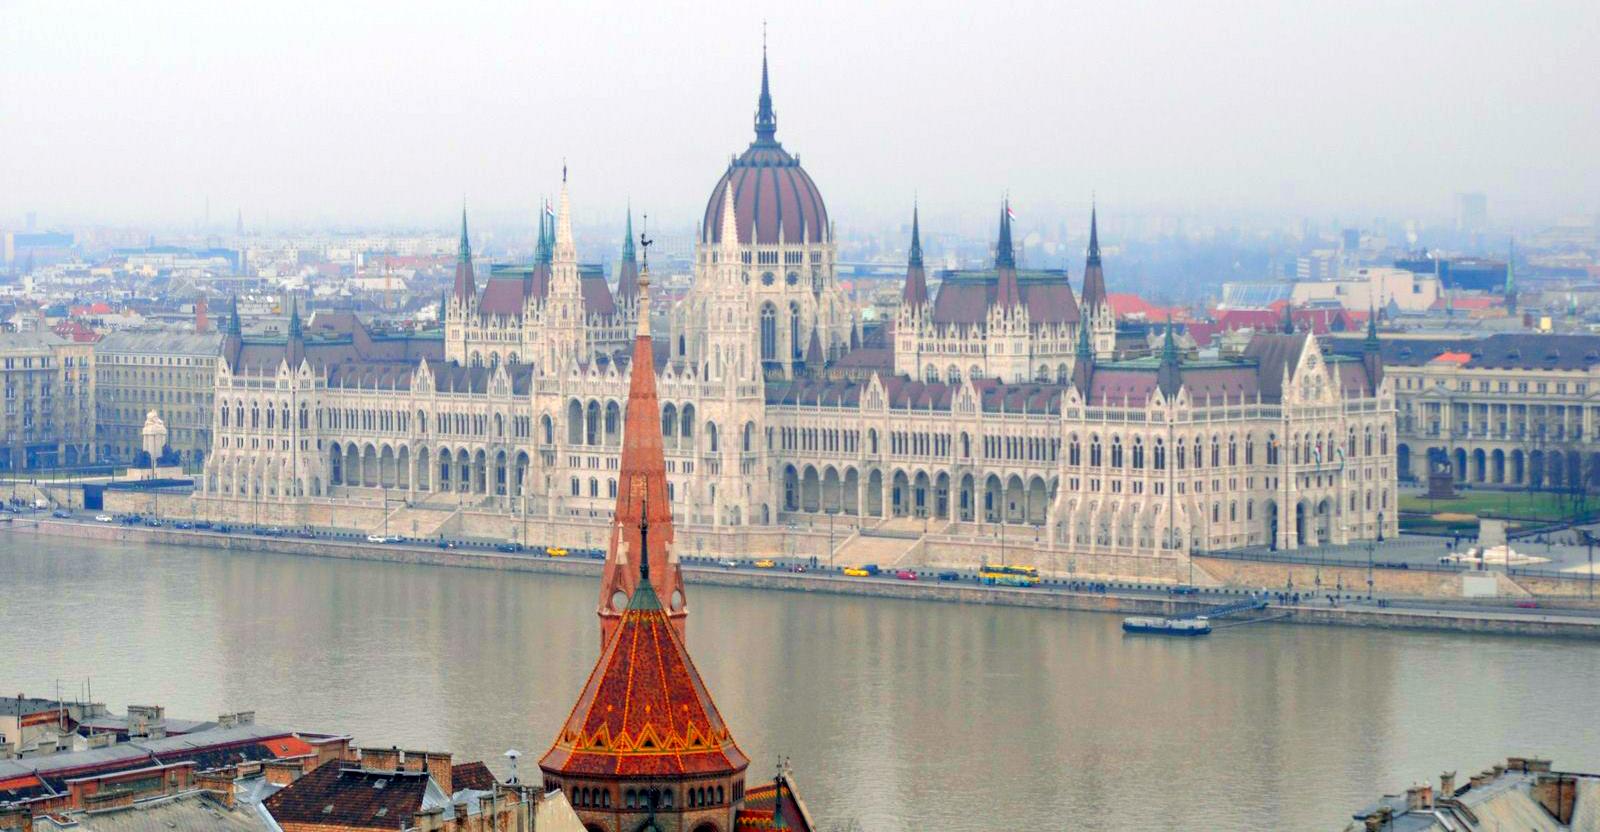 Qué ver en Budapest en un fin de semana: Parlamento de Budapest budapest en un fin de semana - 21396065426 780b19dc10 o - Qué ver en Budapest en un fin de semana